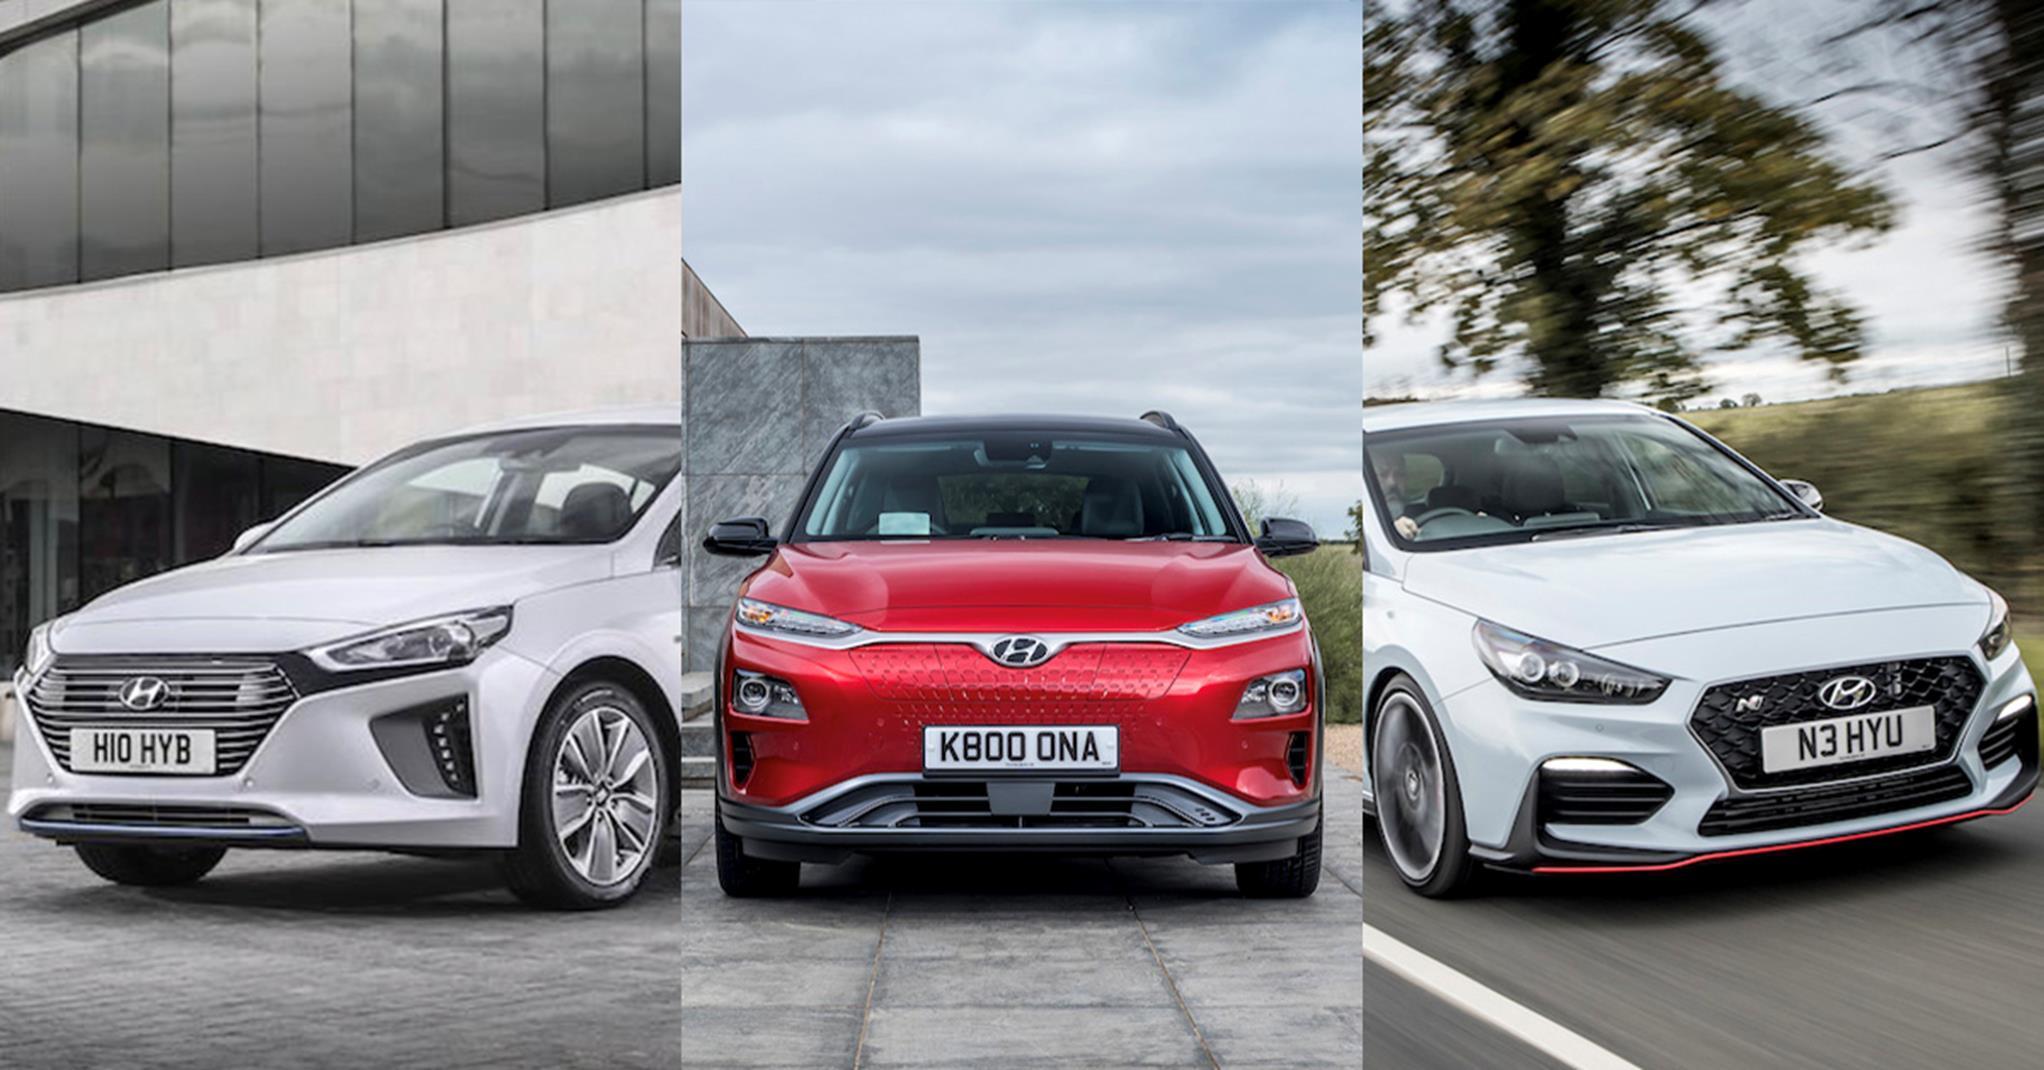 Hyundai diverse car range - IONIQ, KONA, i30N